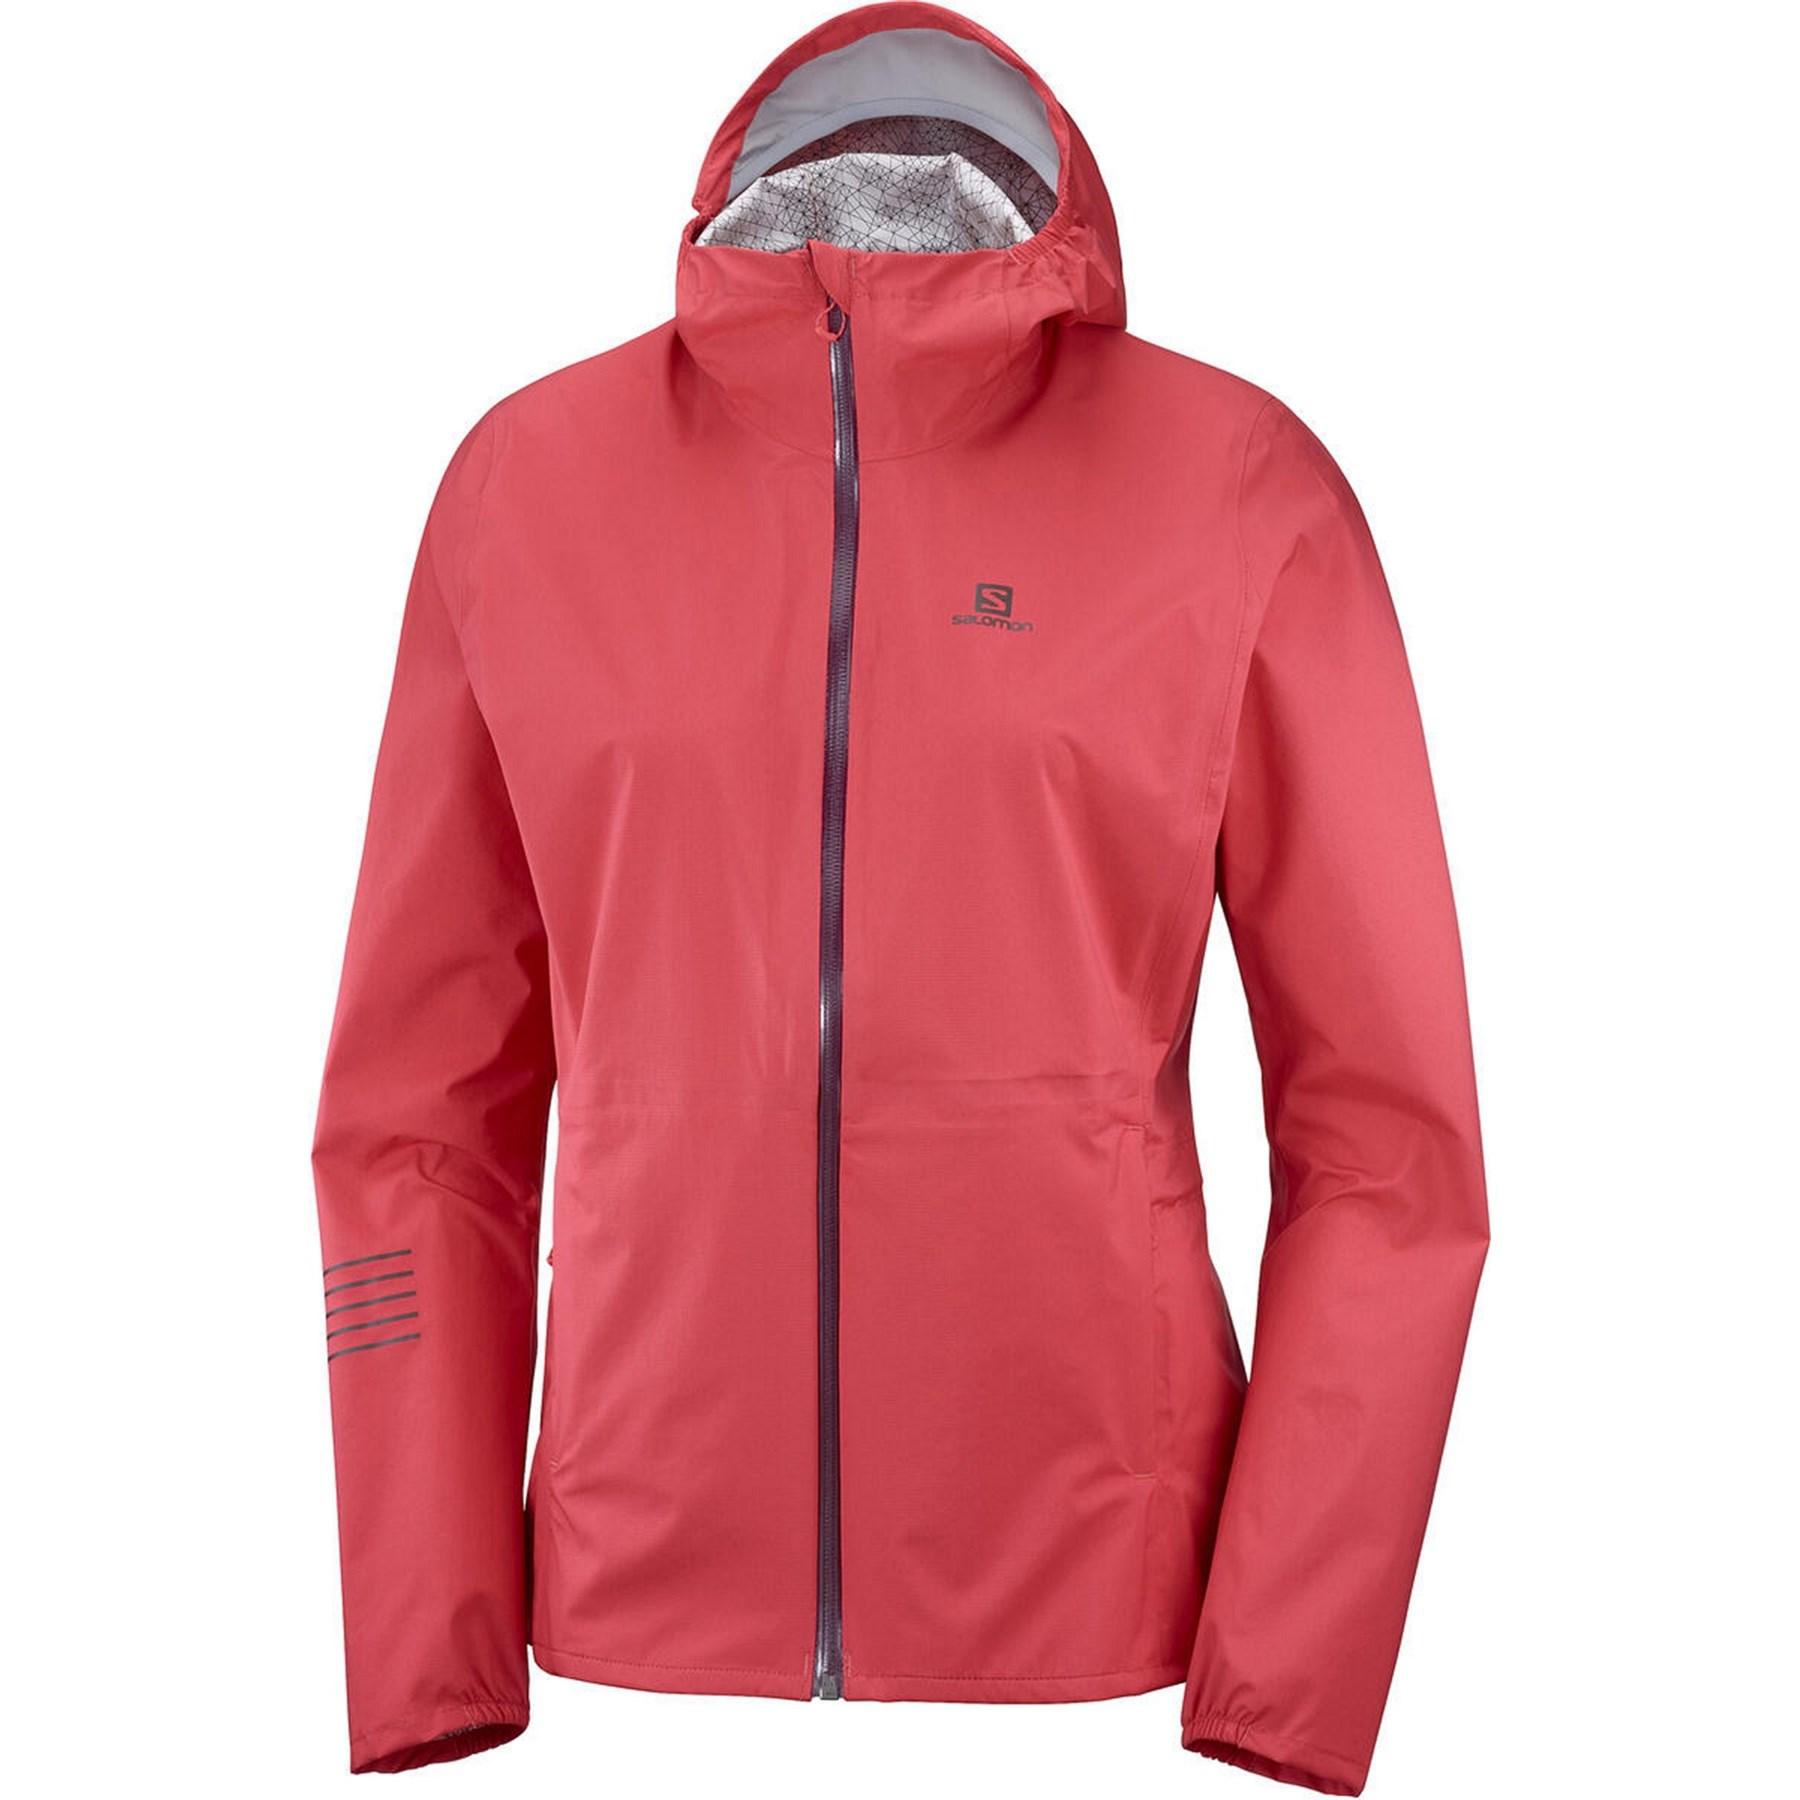 2c2b4ecf6438 Salomon Women s Lightning WP Jacket